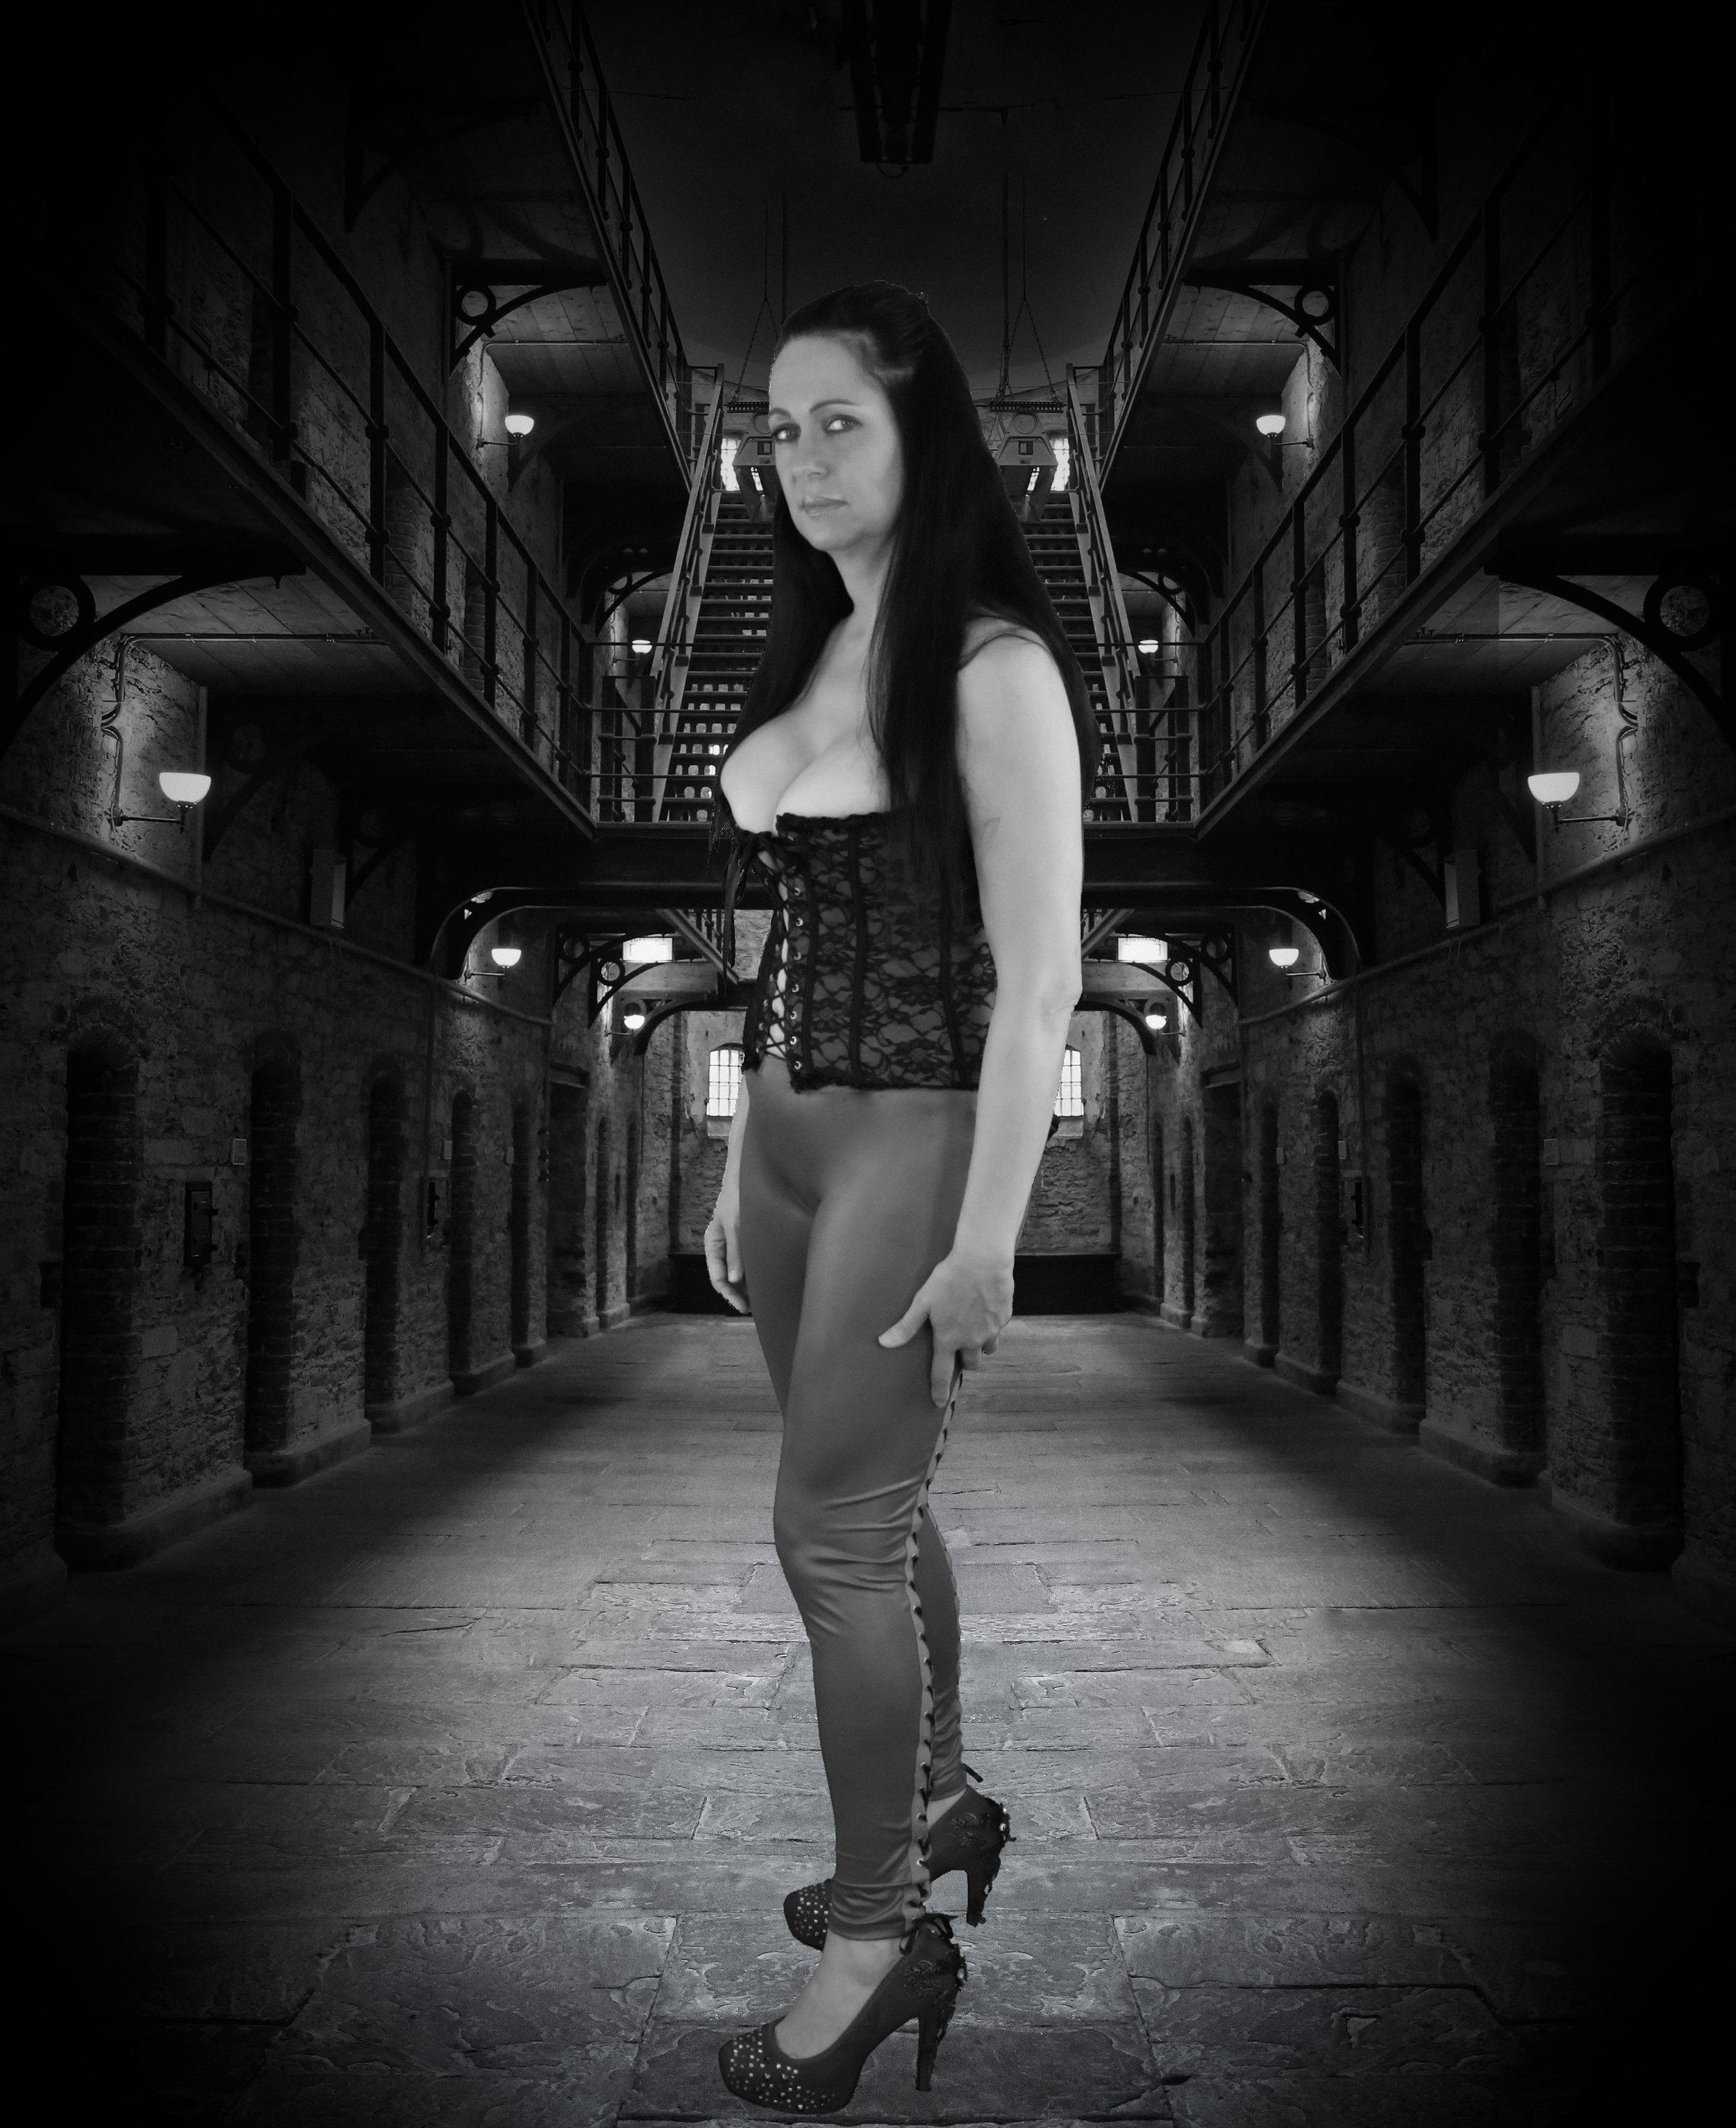 judy-prison-copy.jpg